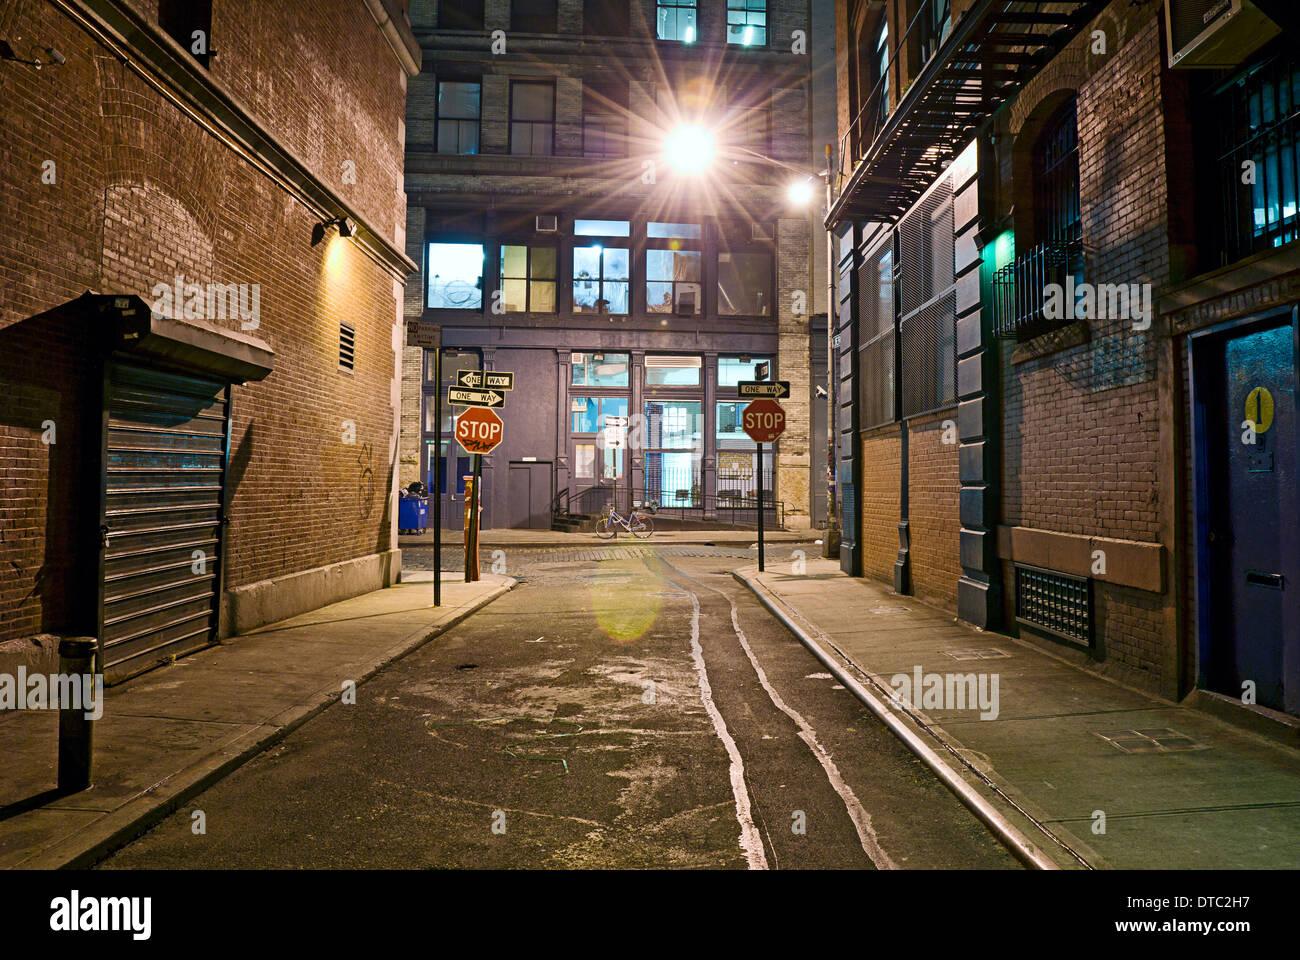 Bezaubernd Urban Industrial Ideen Von Deserted Empty Alleyway In Scene.